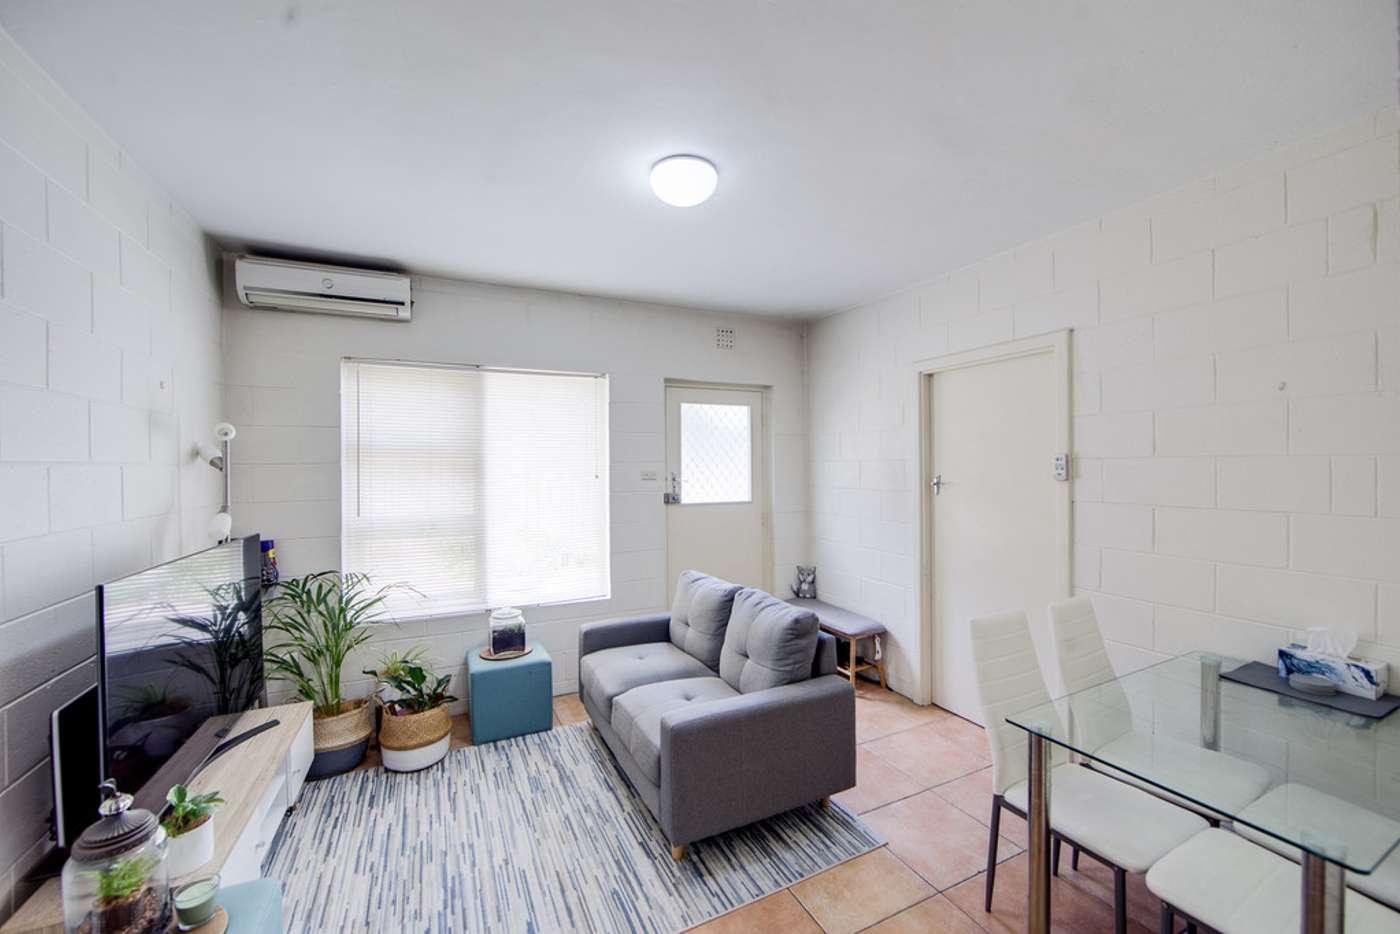 Main view of Homely unit listing, 1/49 Duthy Street, Malvern SA 5061